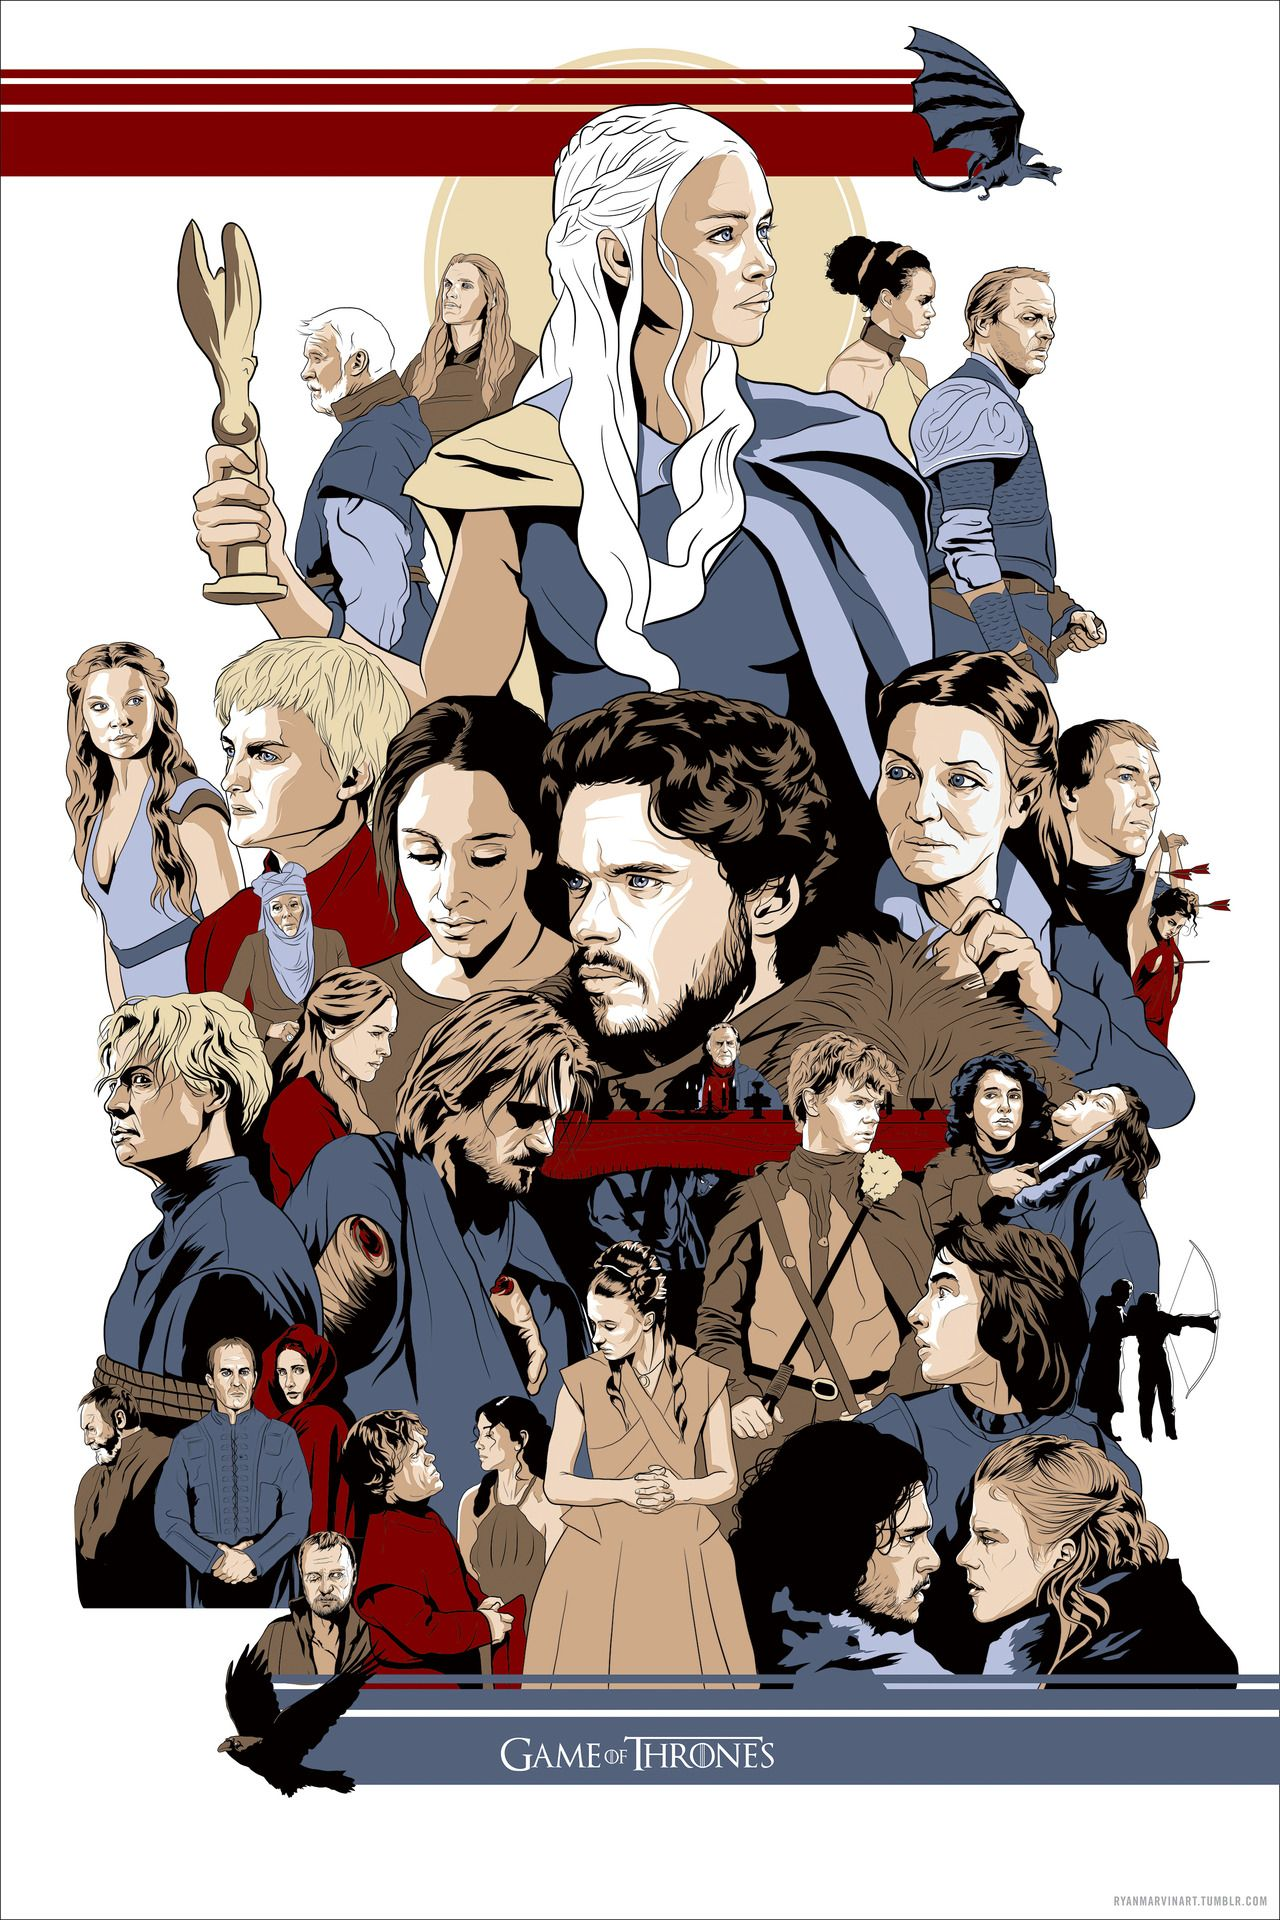 season three artwork by ryan marvin